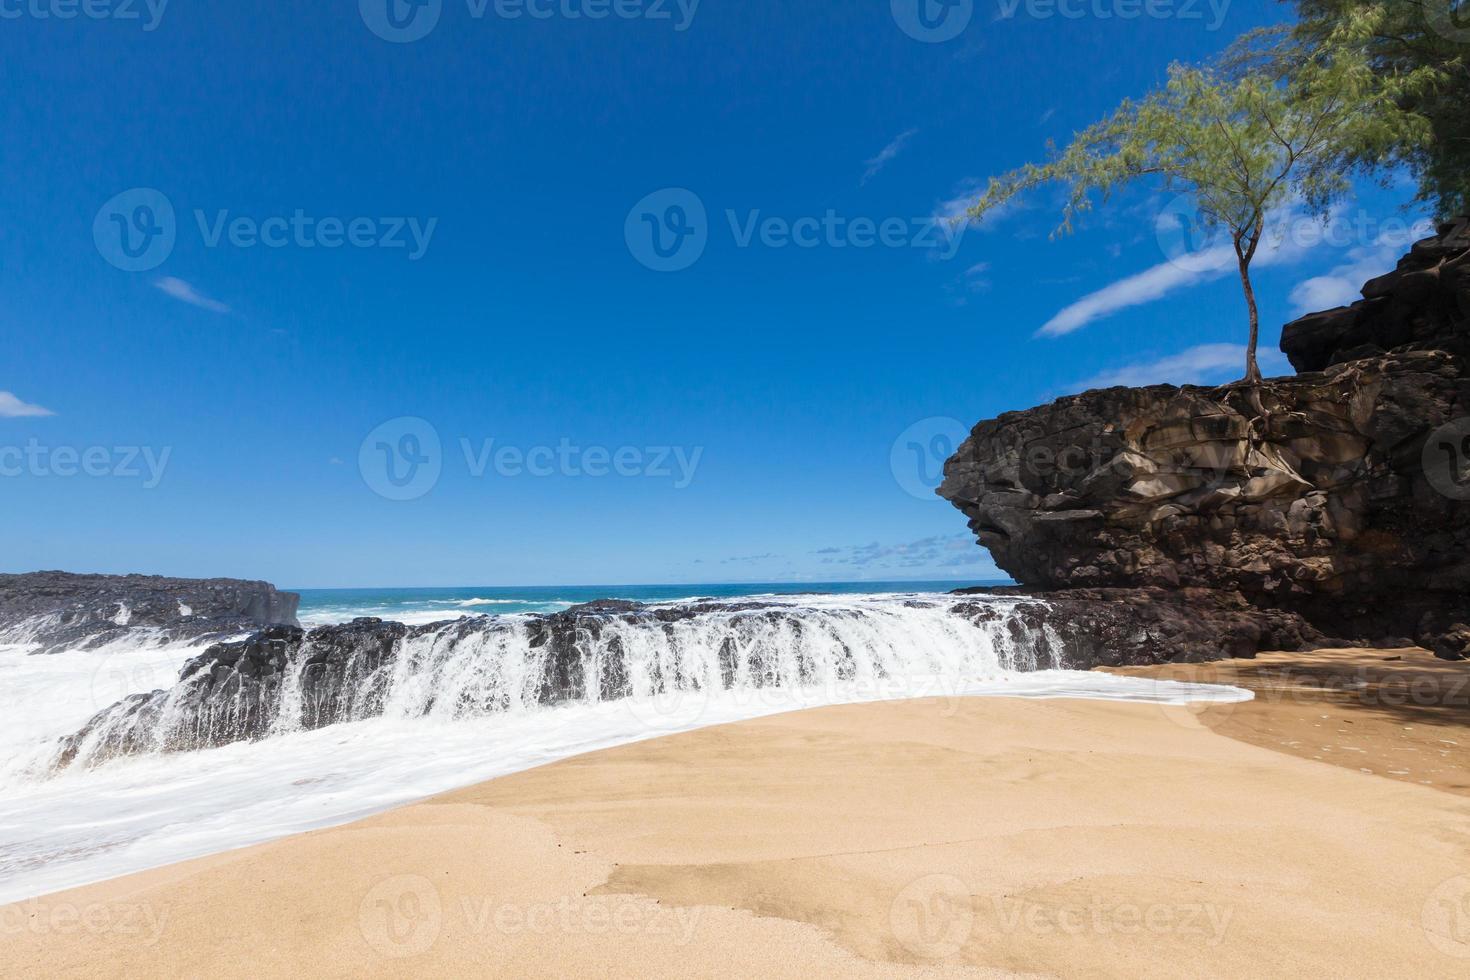 golven spatten over lavasteen op prachtige tropische zandstrand foto